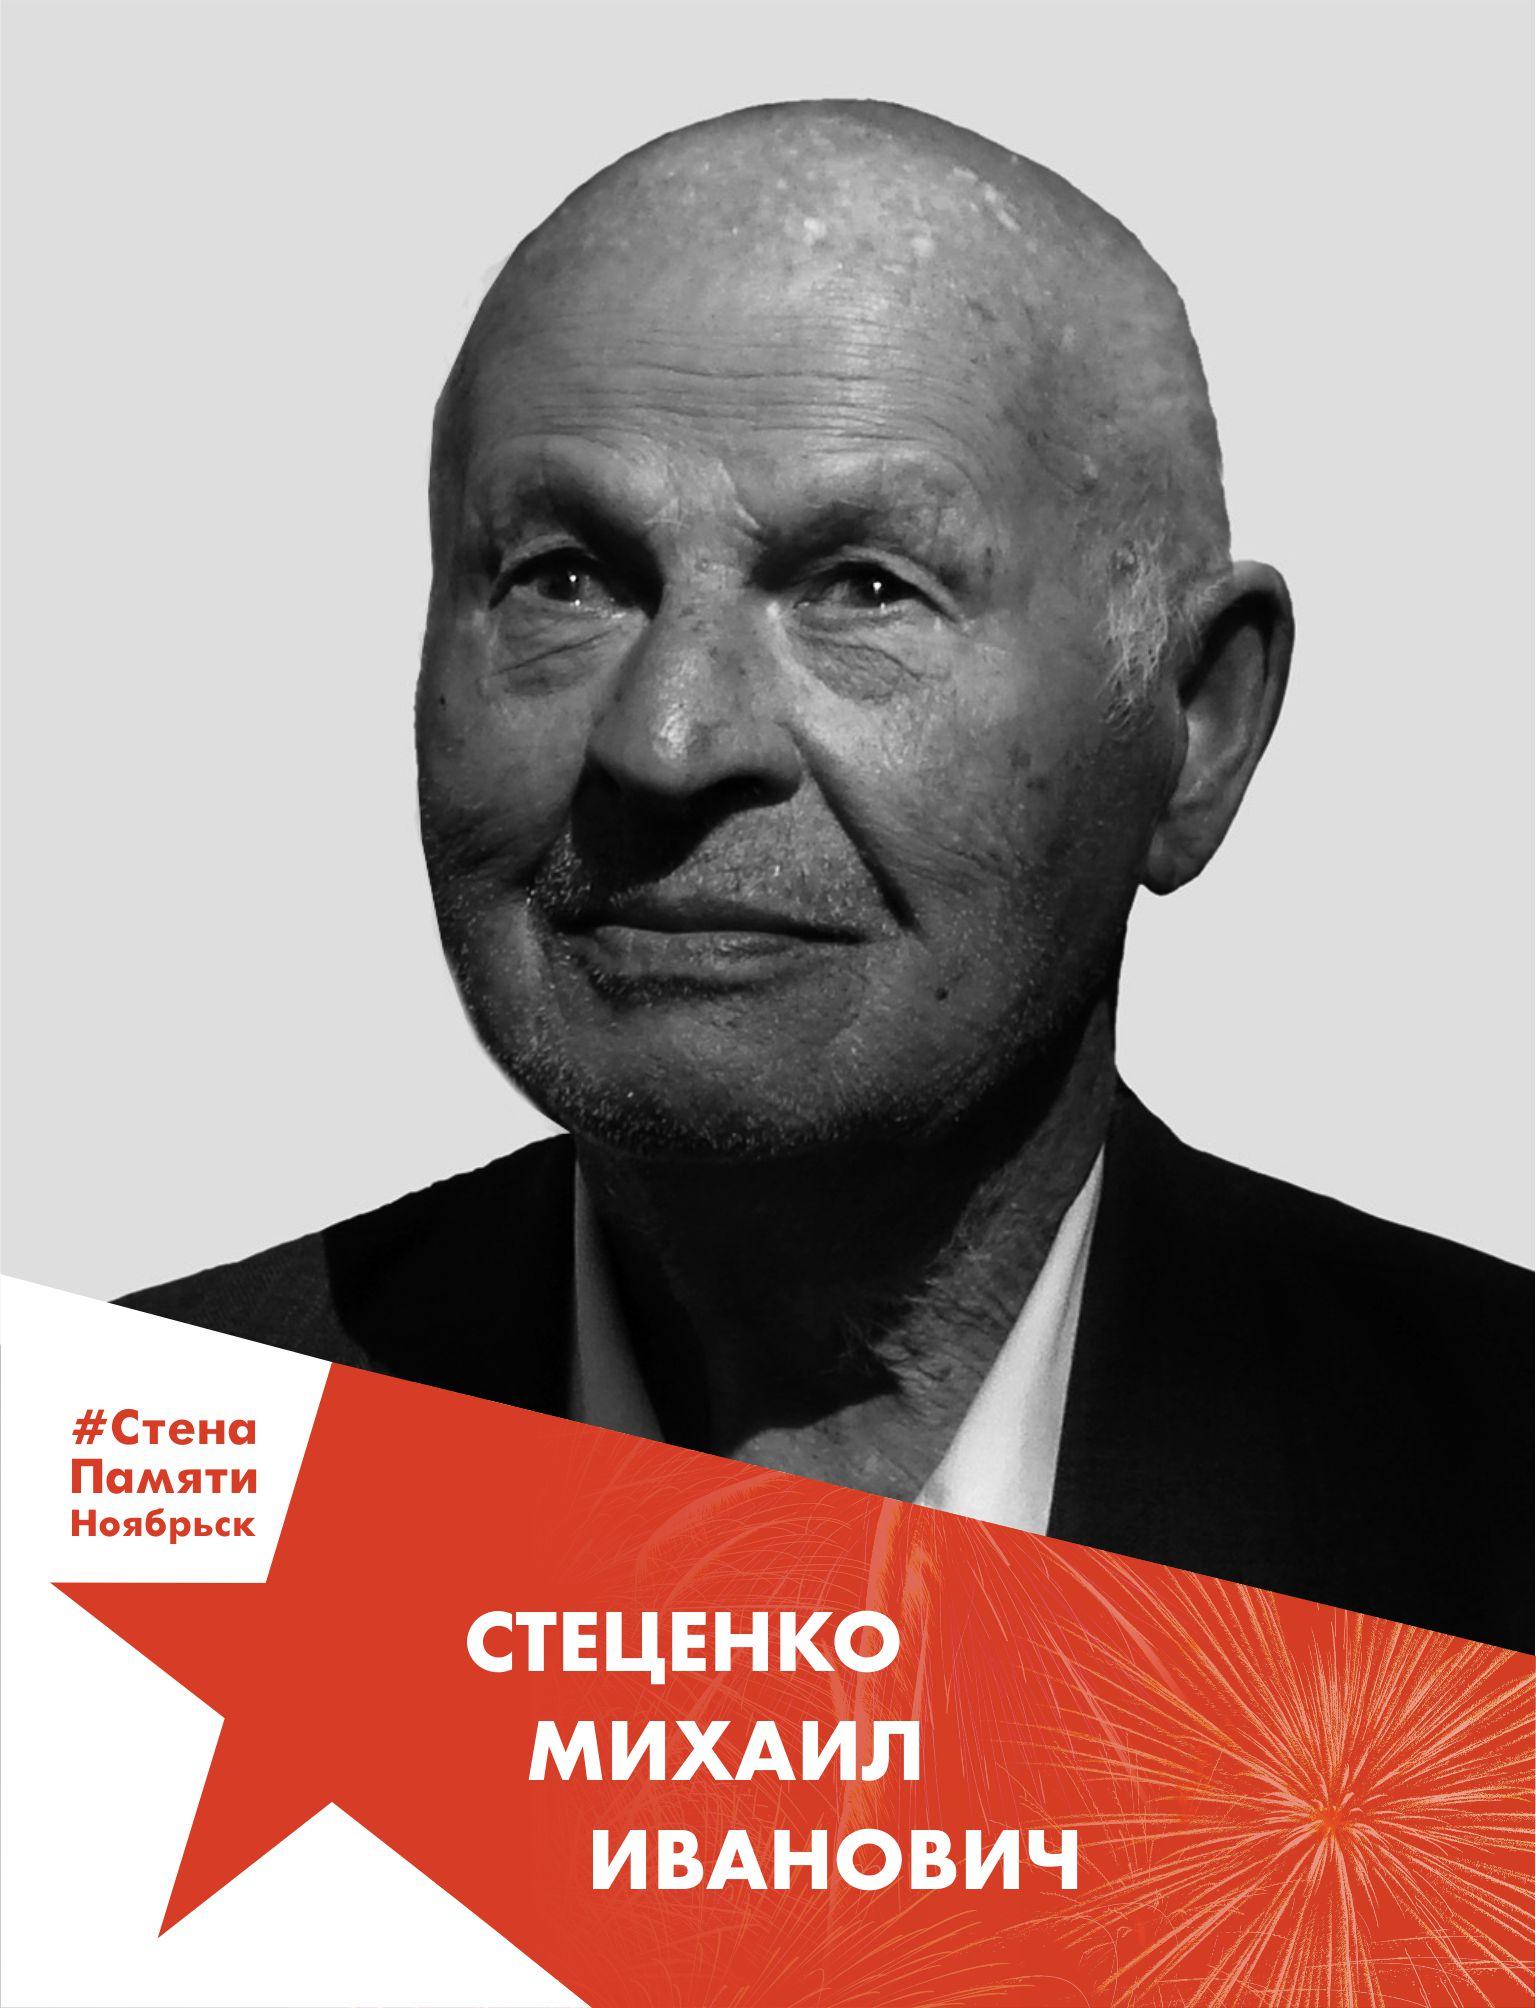 Стеценко Михаил Иванович